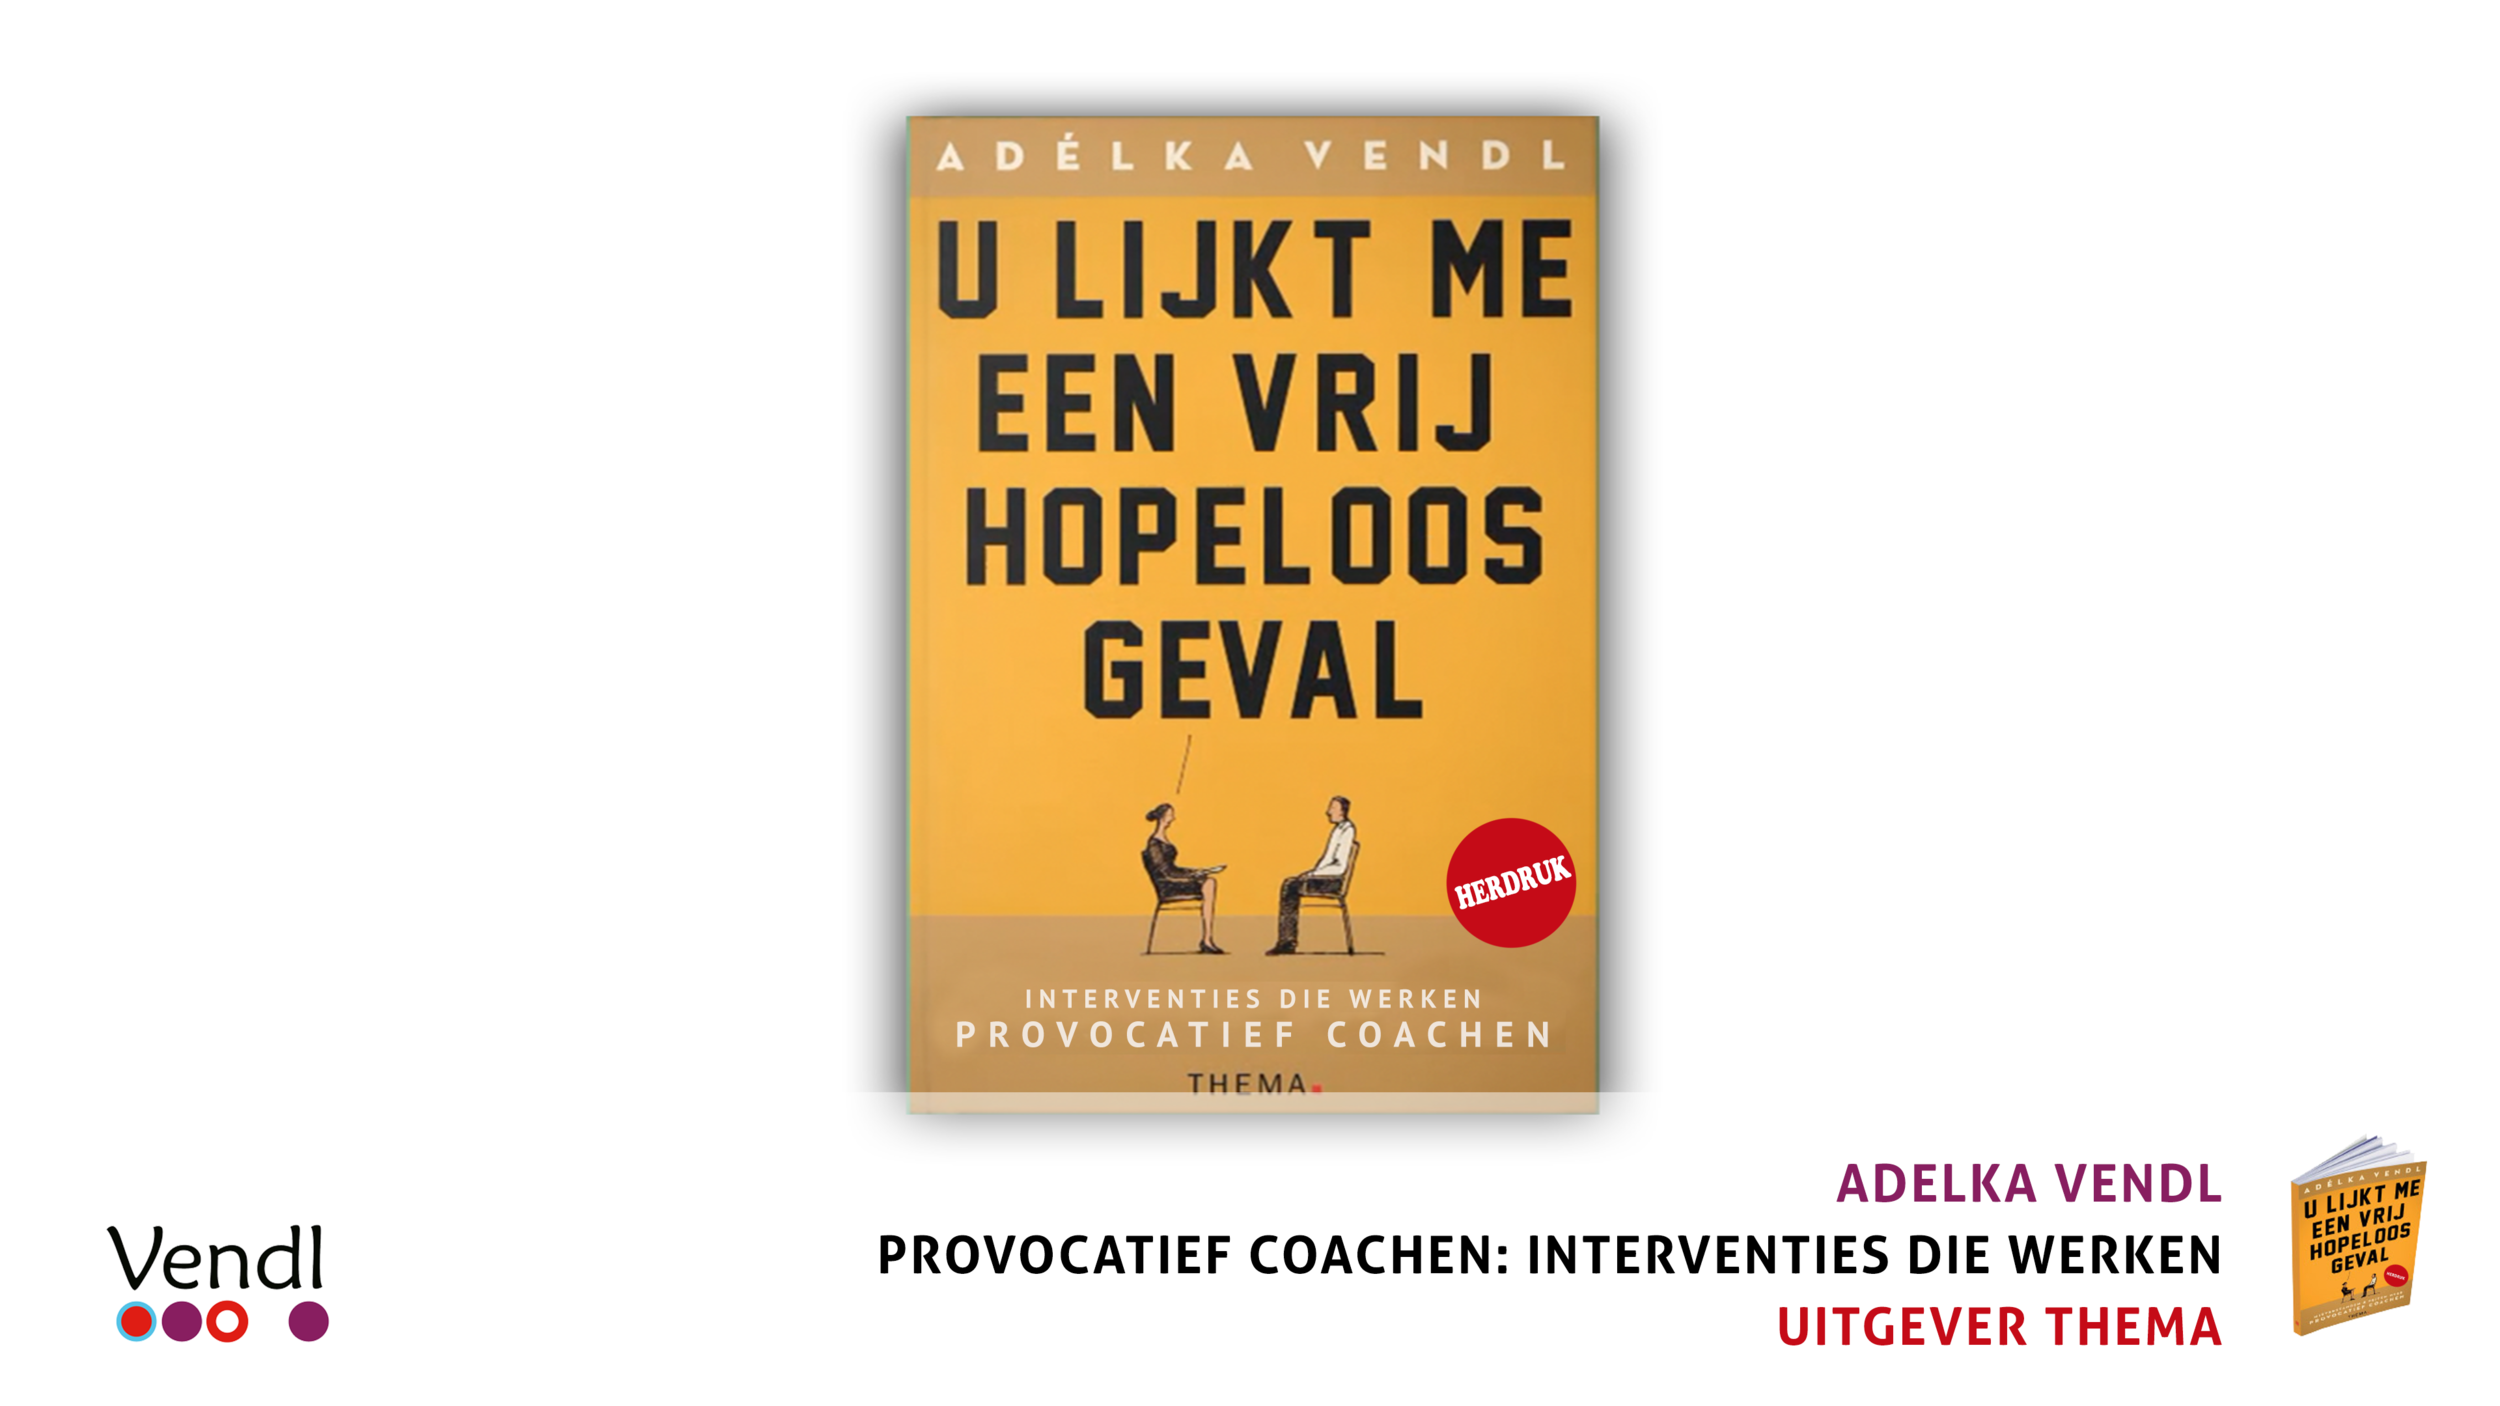 Herdruk-boek-Adelka-Vendl-Youtube01.png